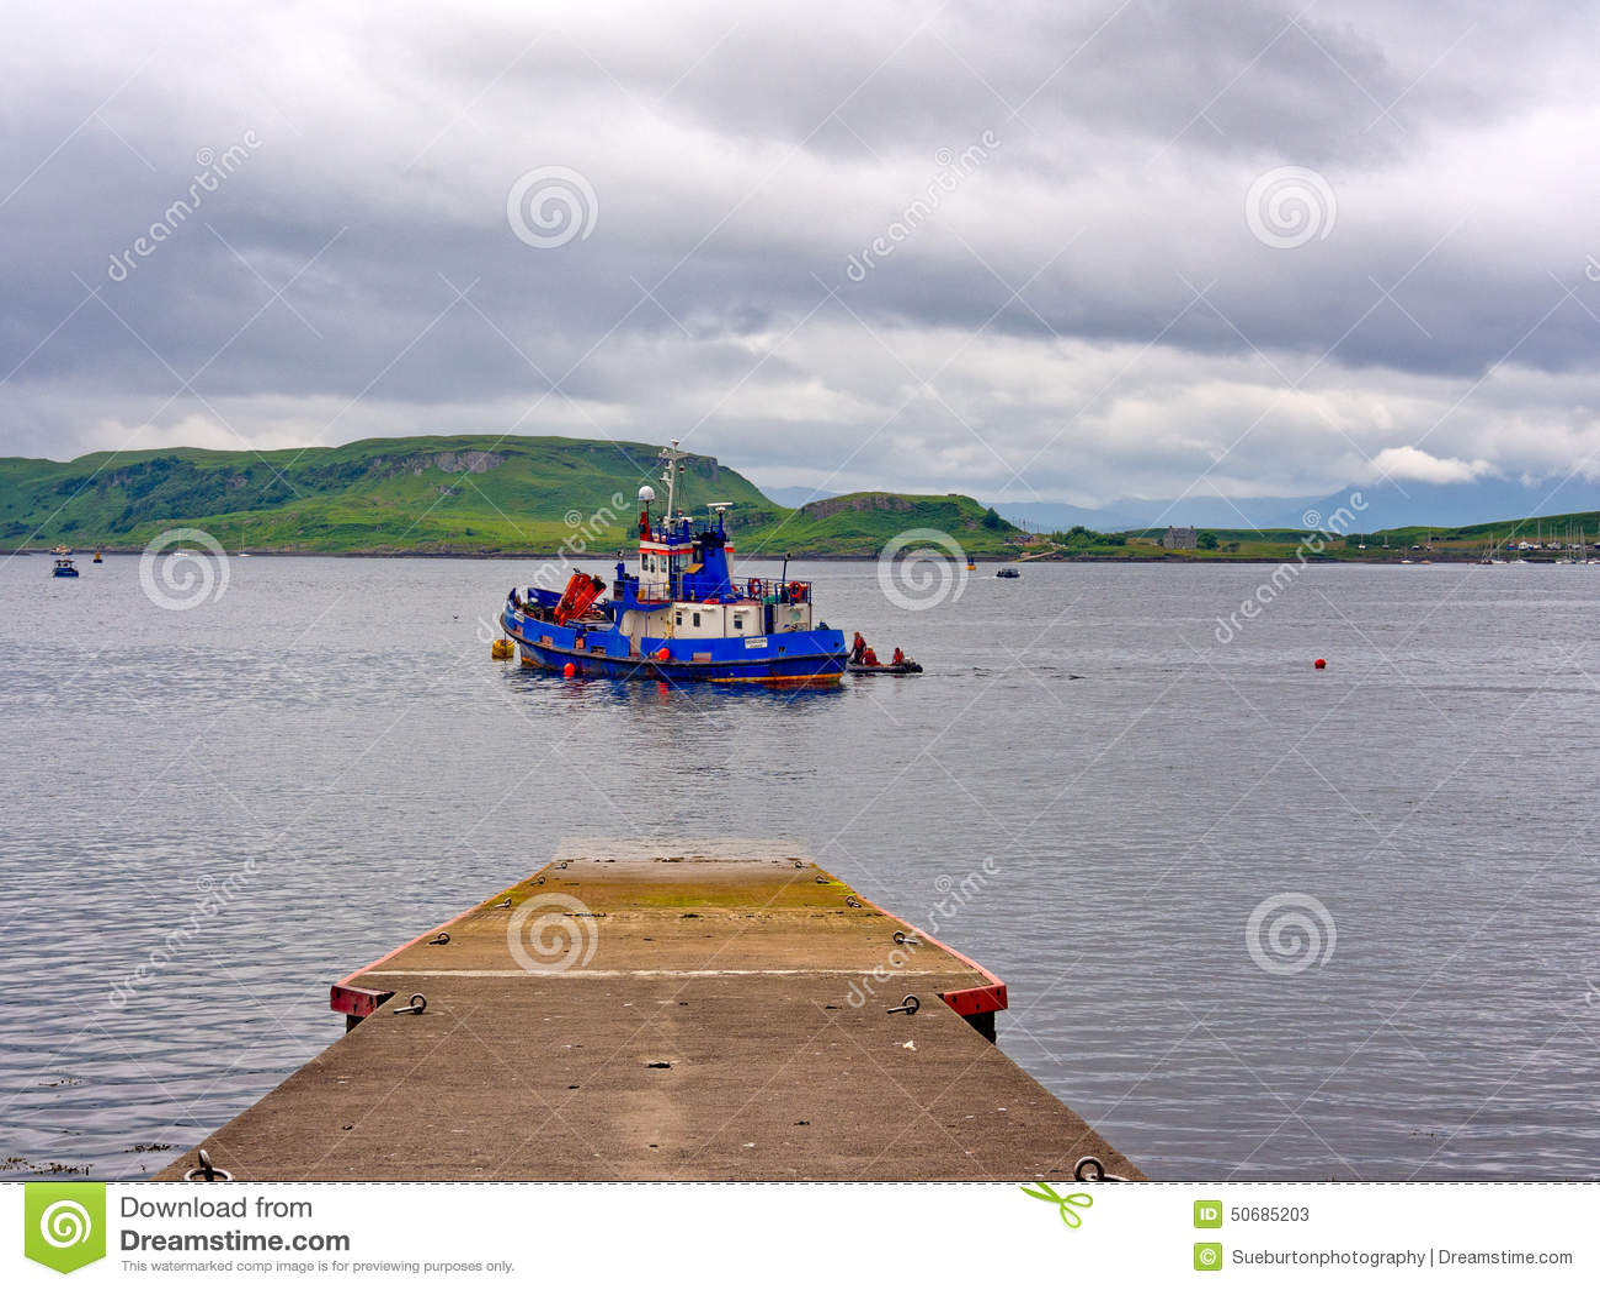 Download Oban的港口 编辑类库存照片. 图片 包括有 乘客, 水库, 港口, 横向, 重新创建, 威士忌酒, 天空 - 50685203